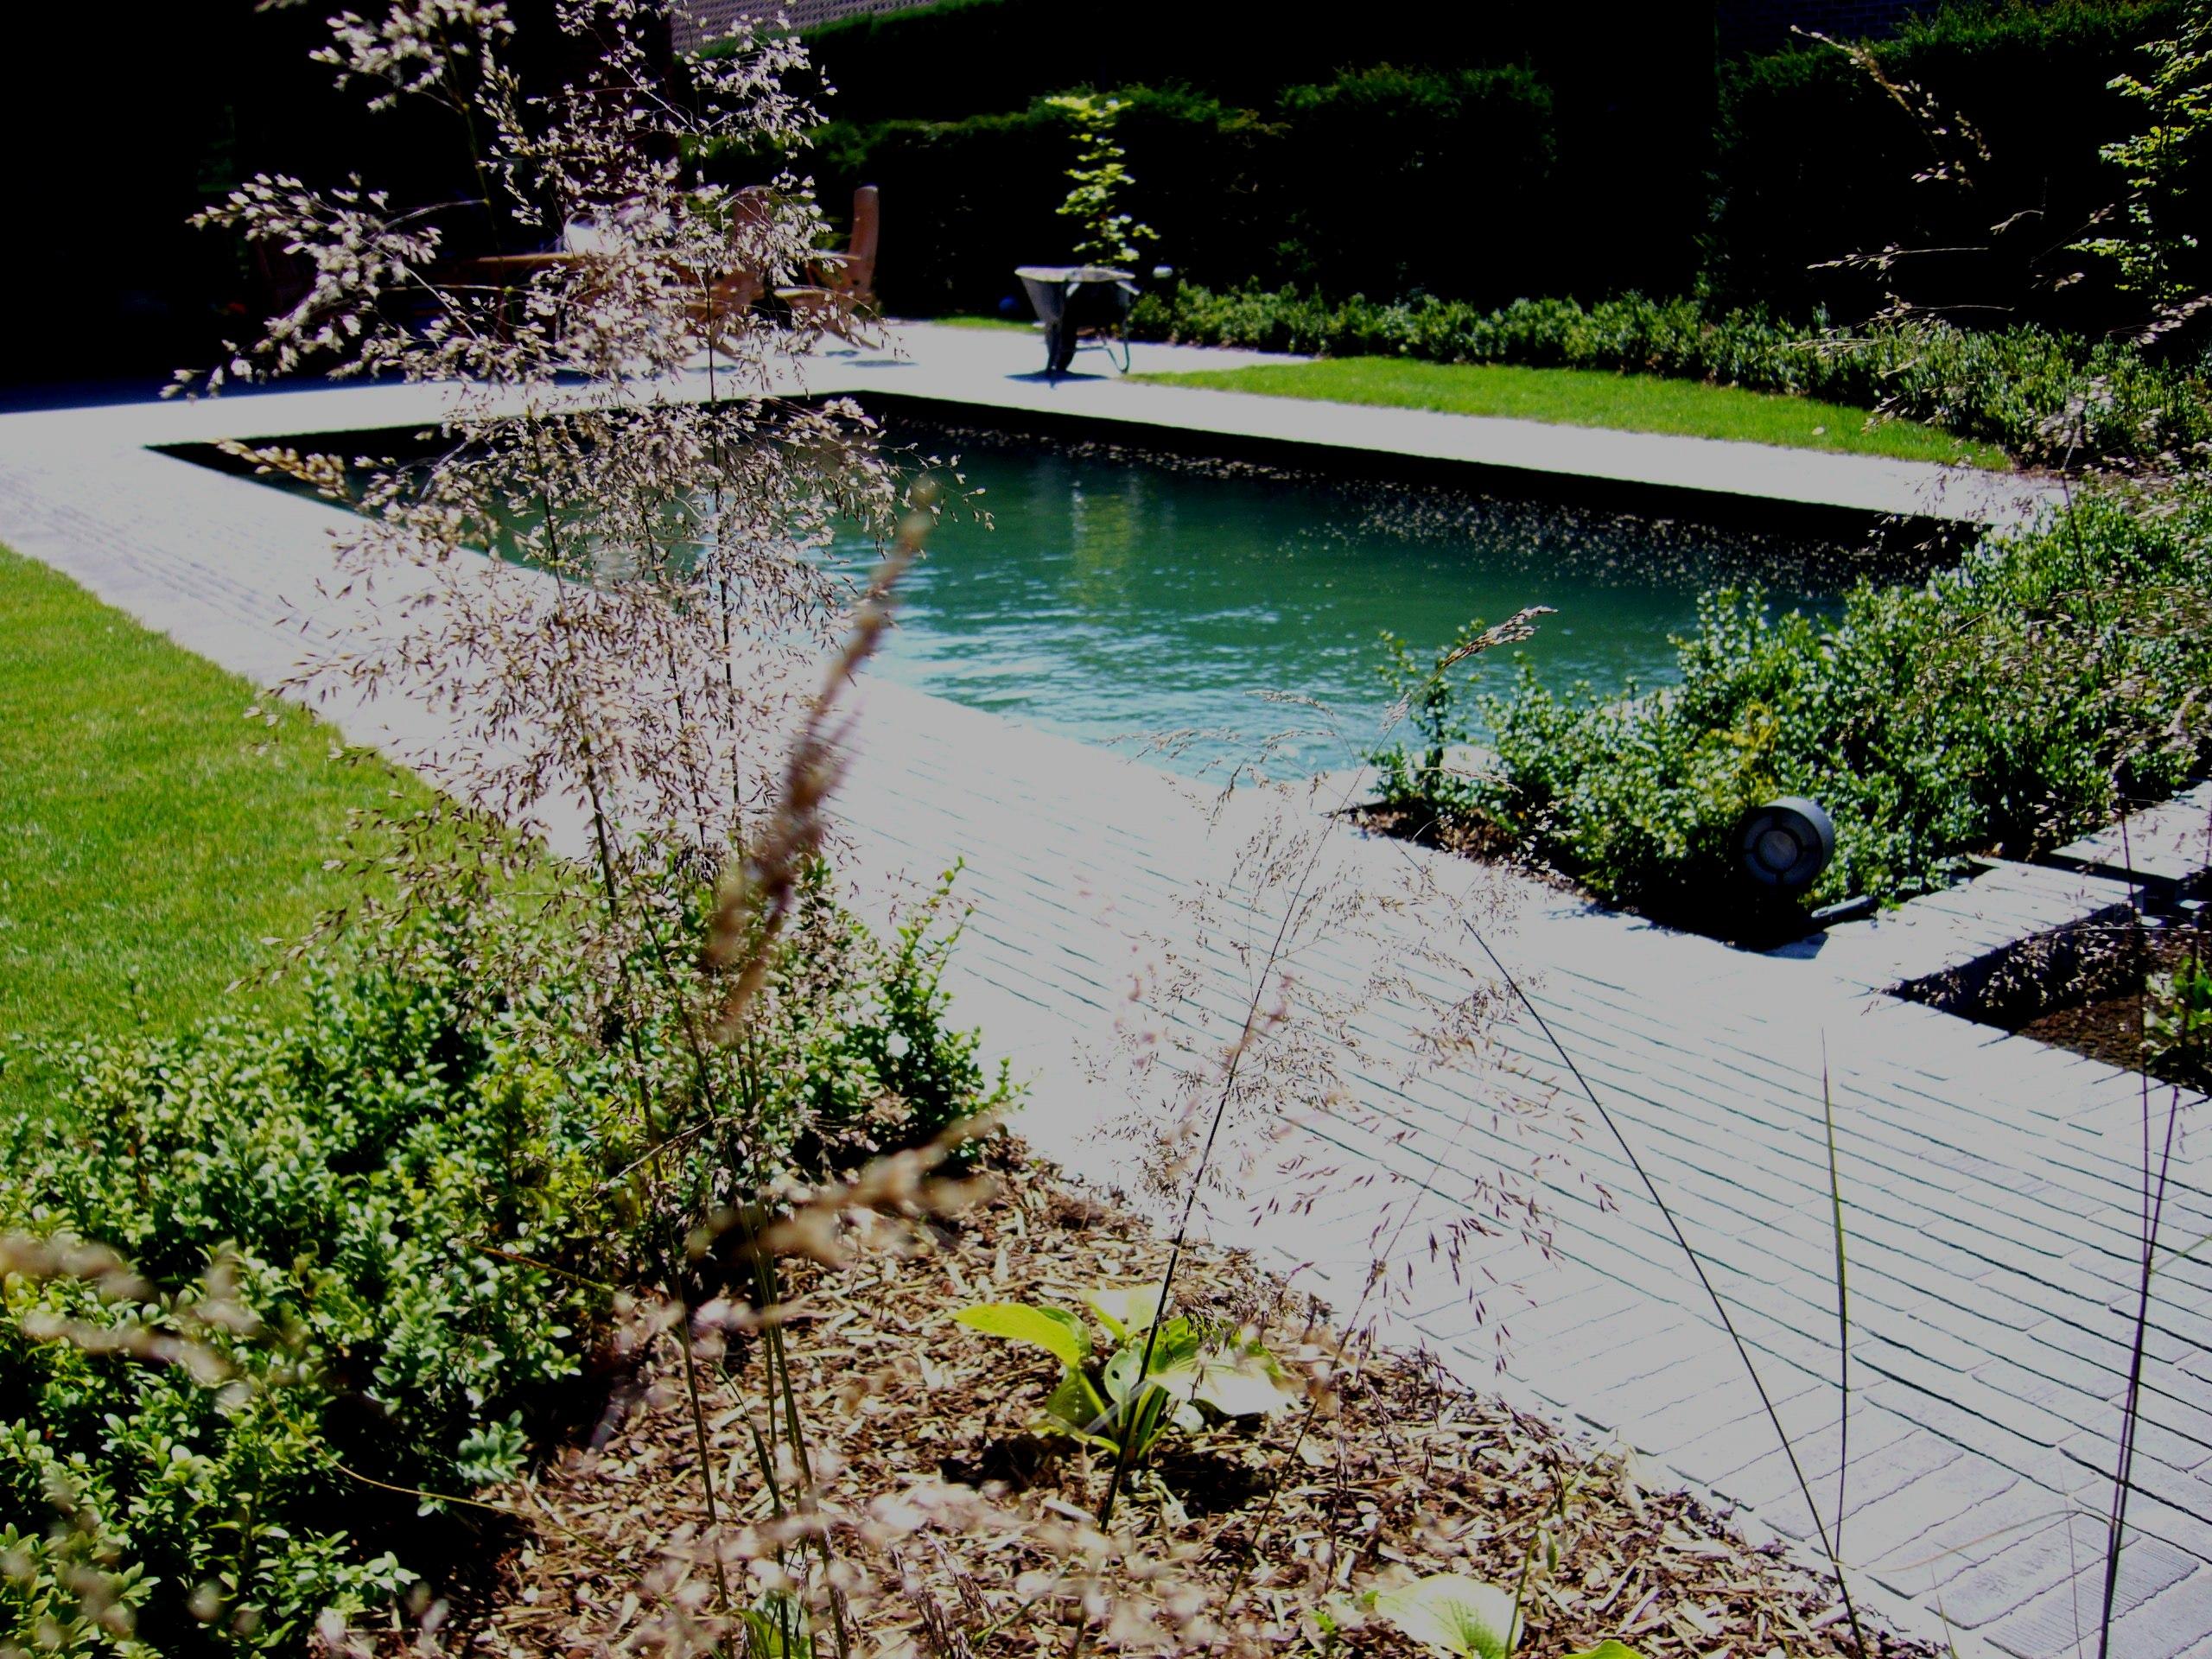 zwemvijver in beplanting